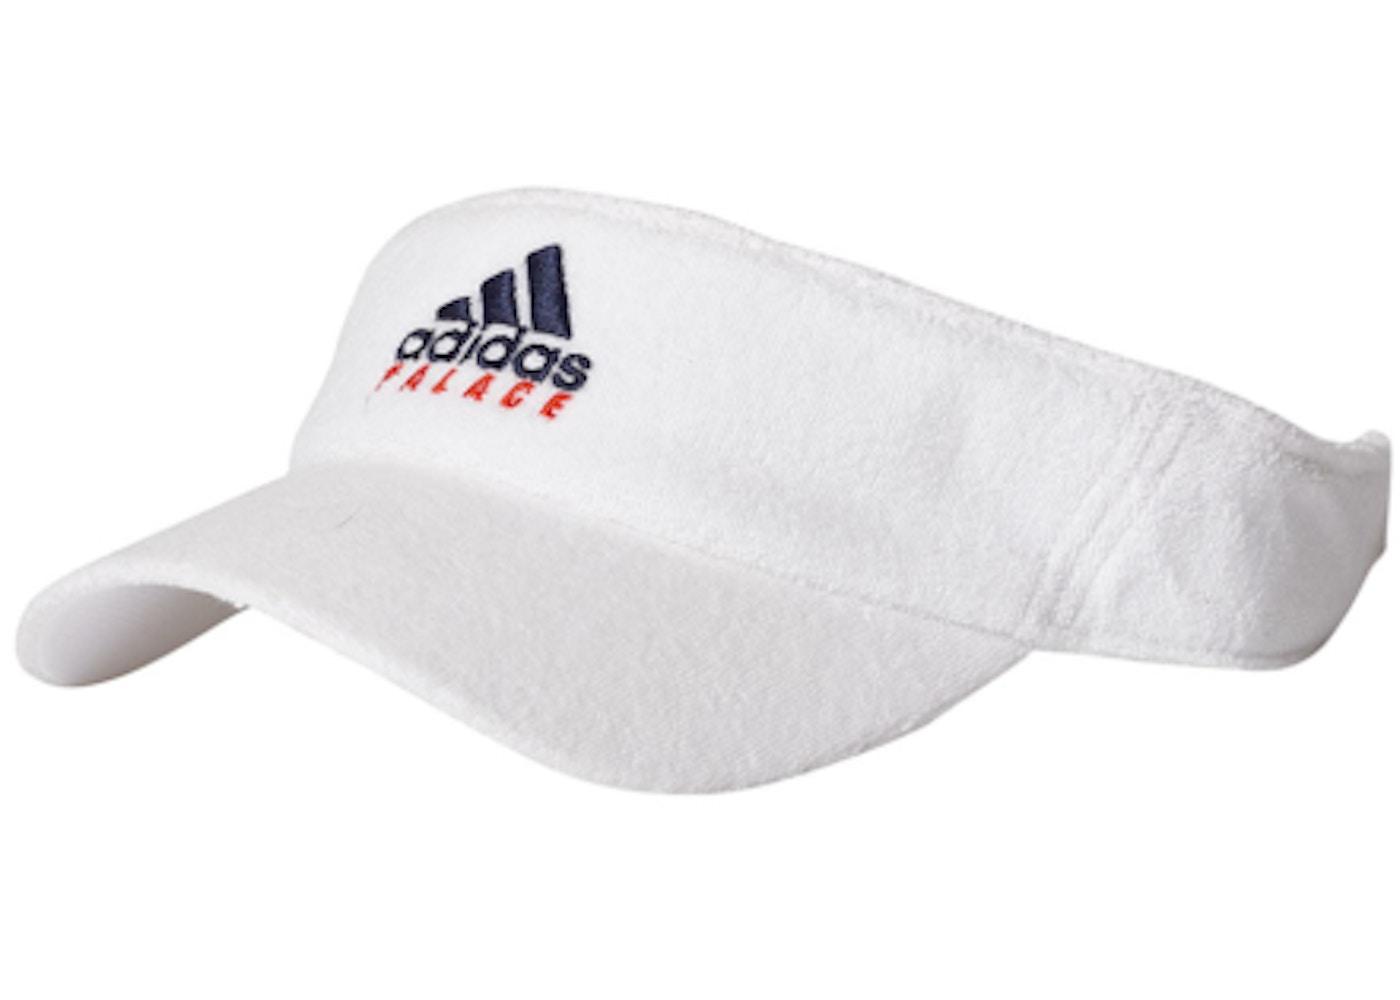 03eda793a45 Palace adidas On Court Towel Visor White - SS18